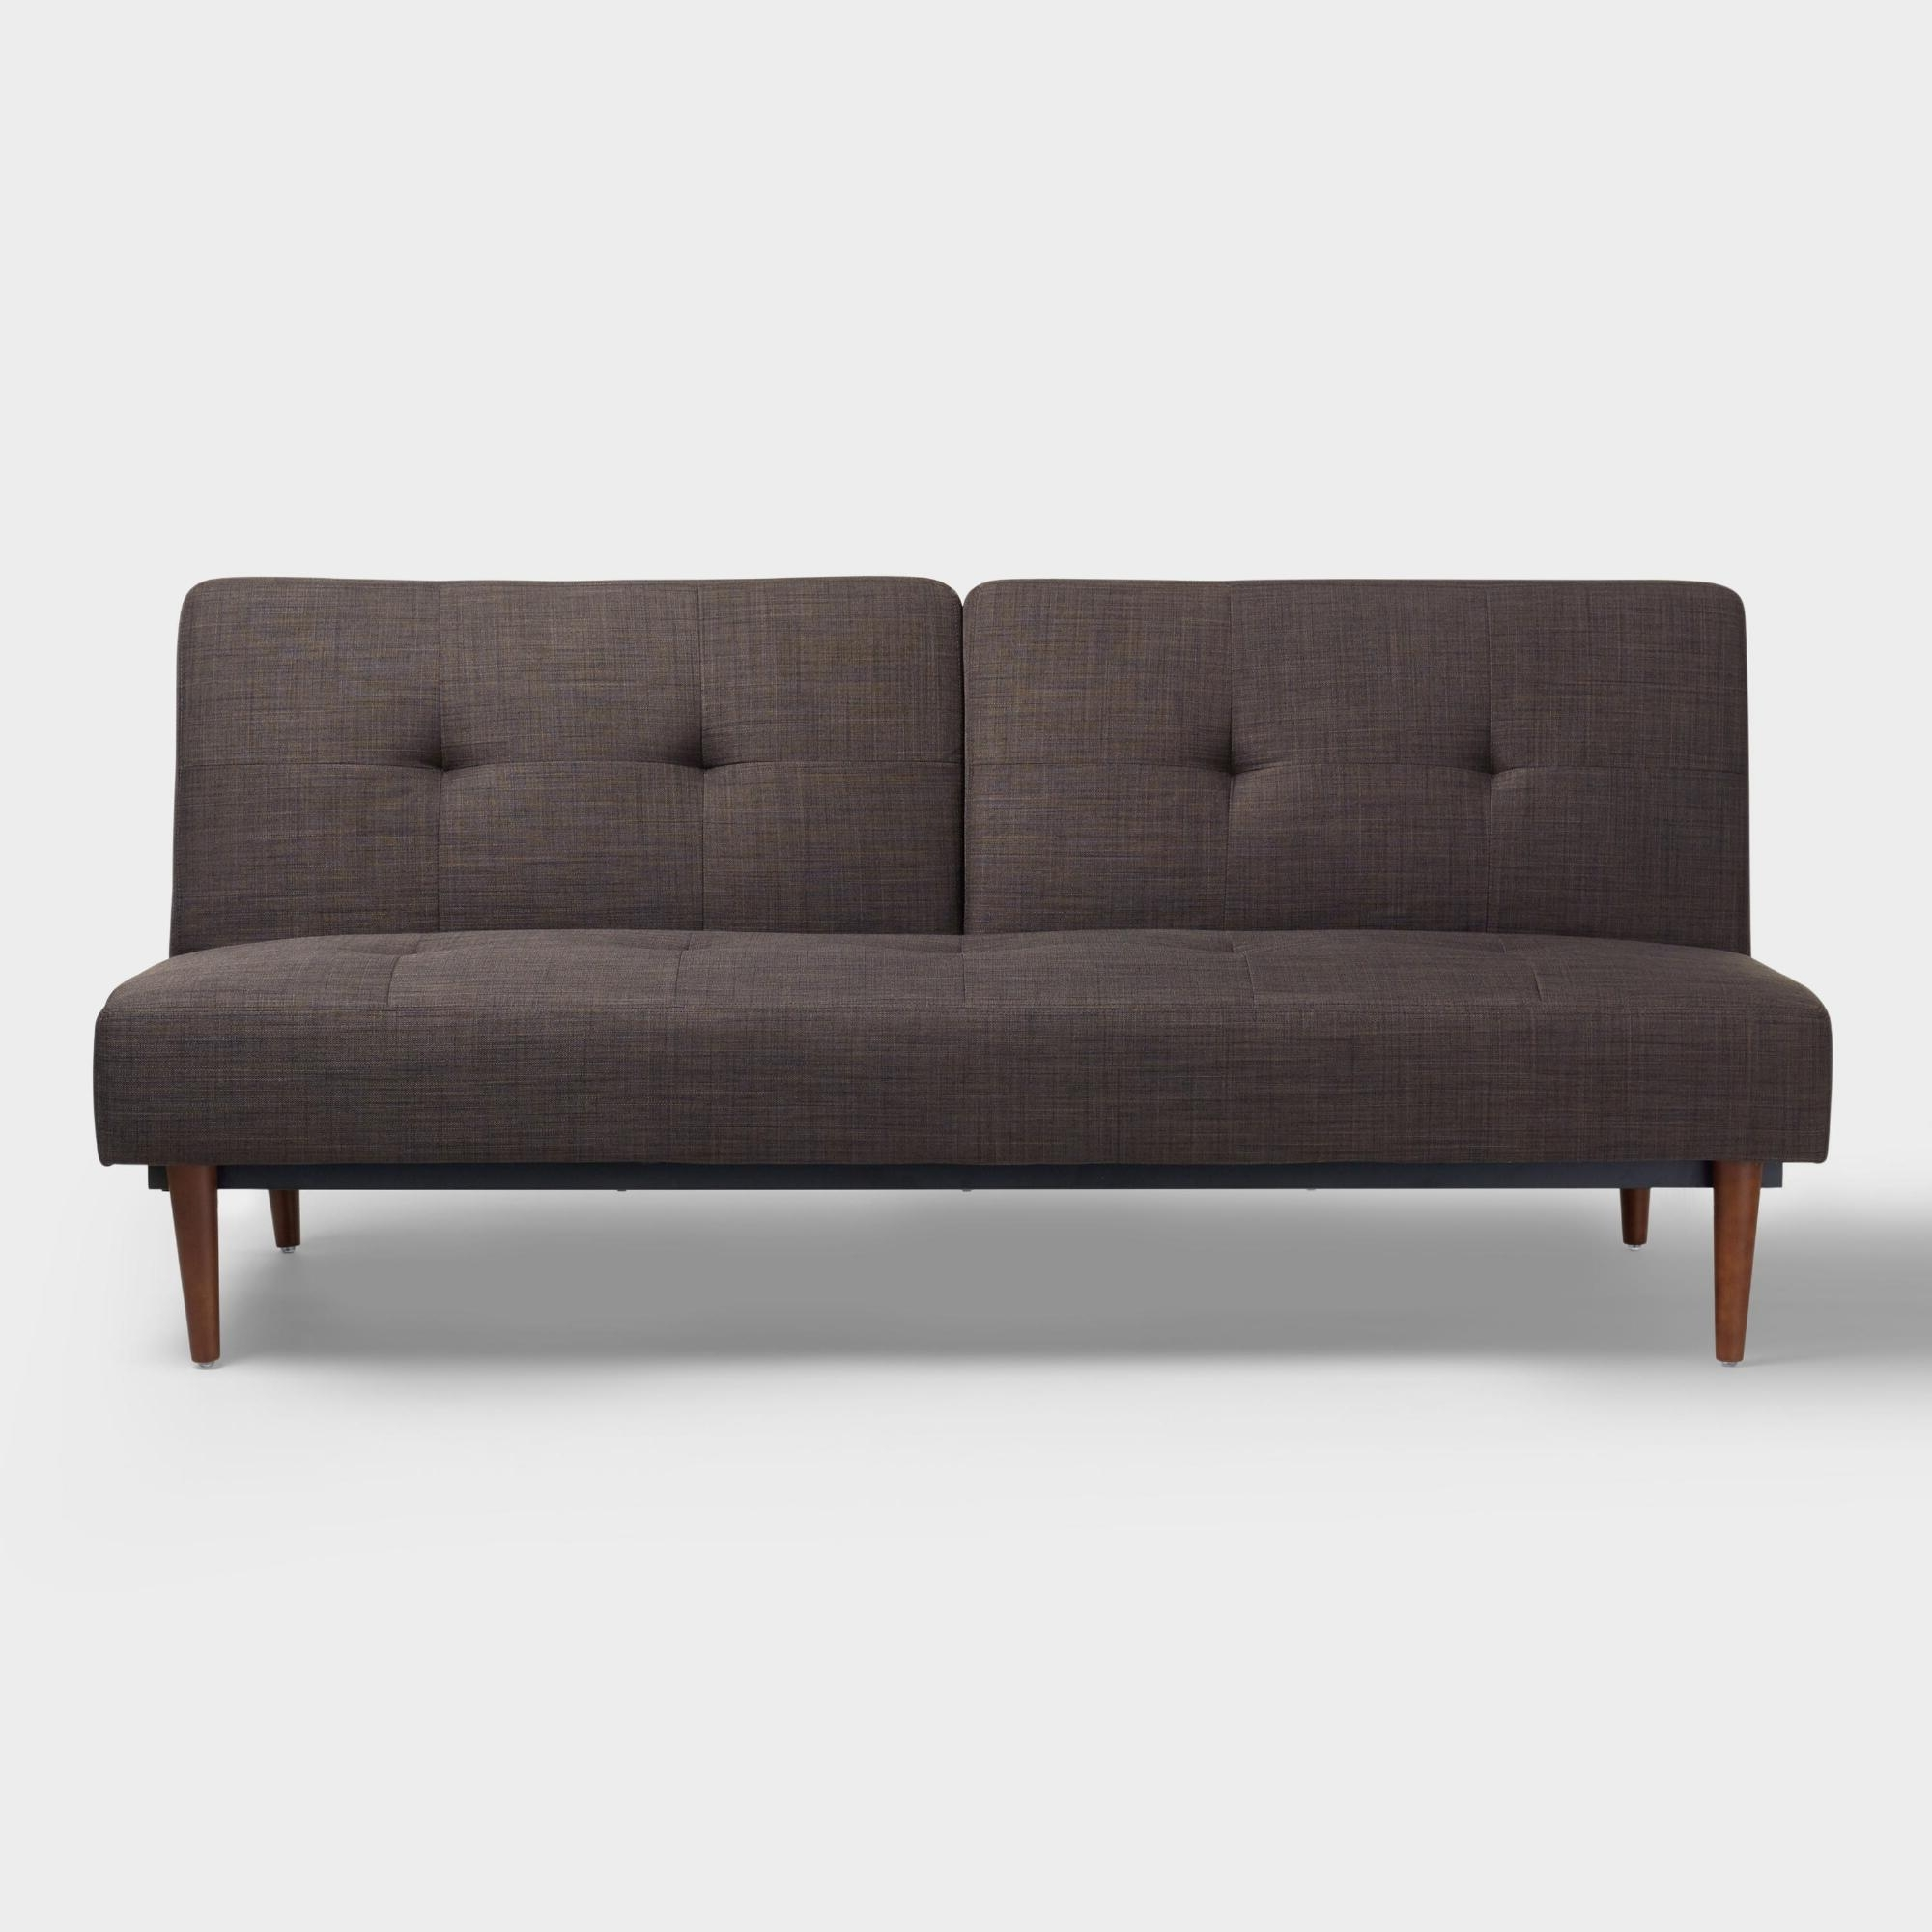 Chairs : Blue Velvet Sofa Stunning Wide Sofa Chairs 25 Stunning In Popular Wide Sofa Chairs (View 2 of 20)